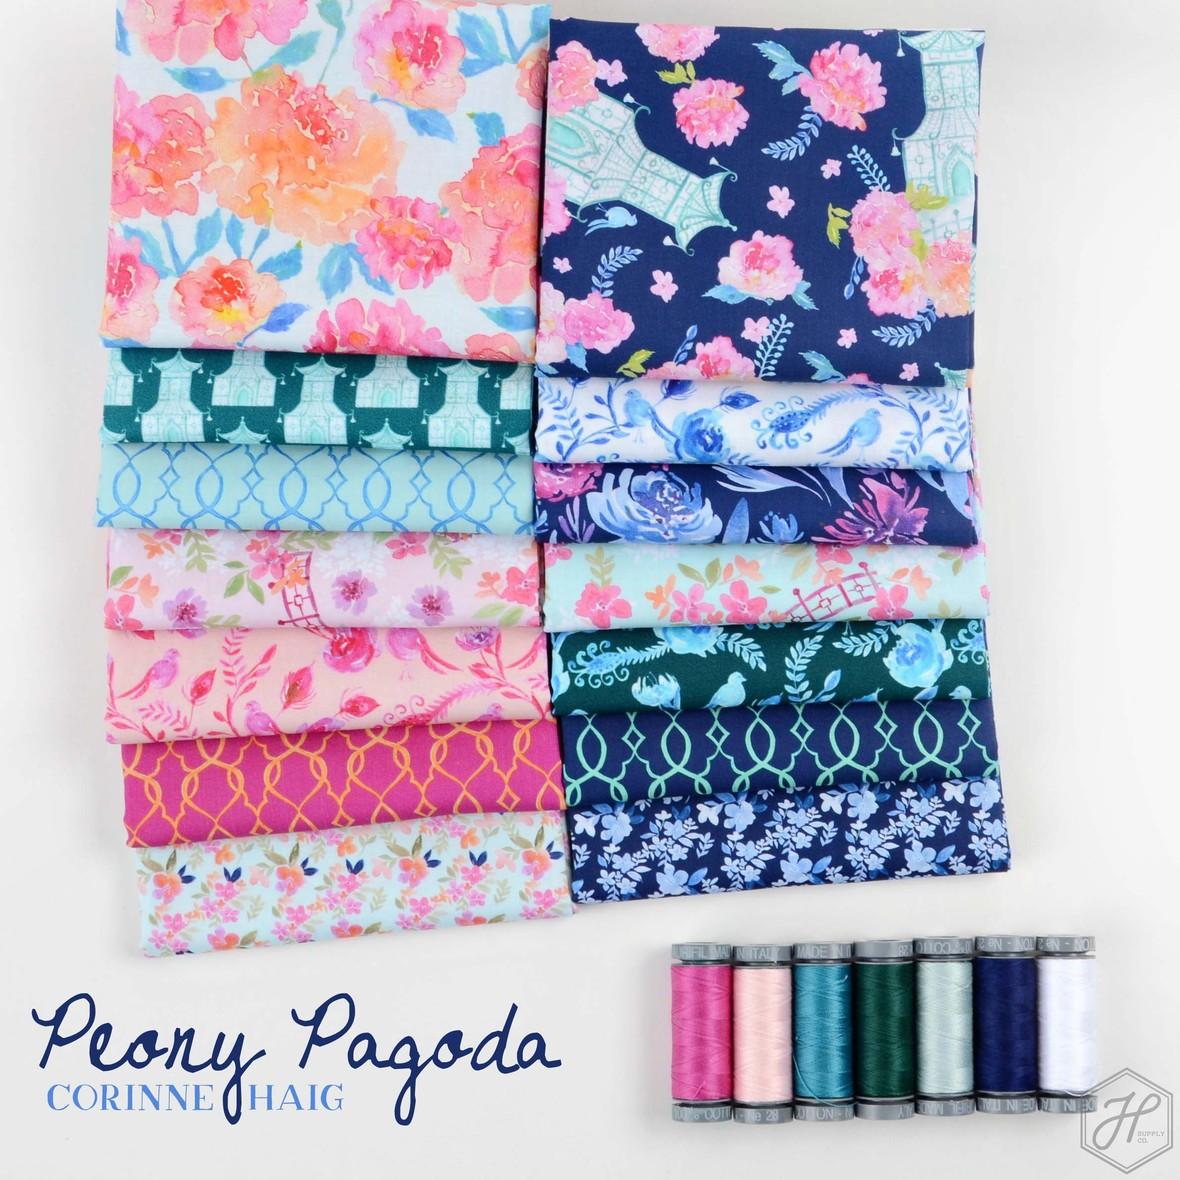 Peony Pagoda Fabric Poster